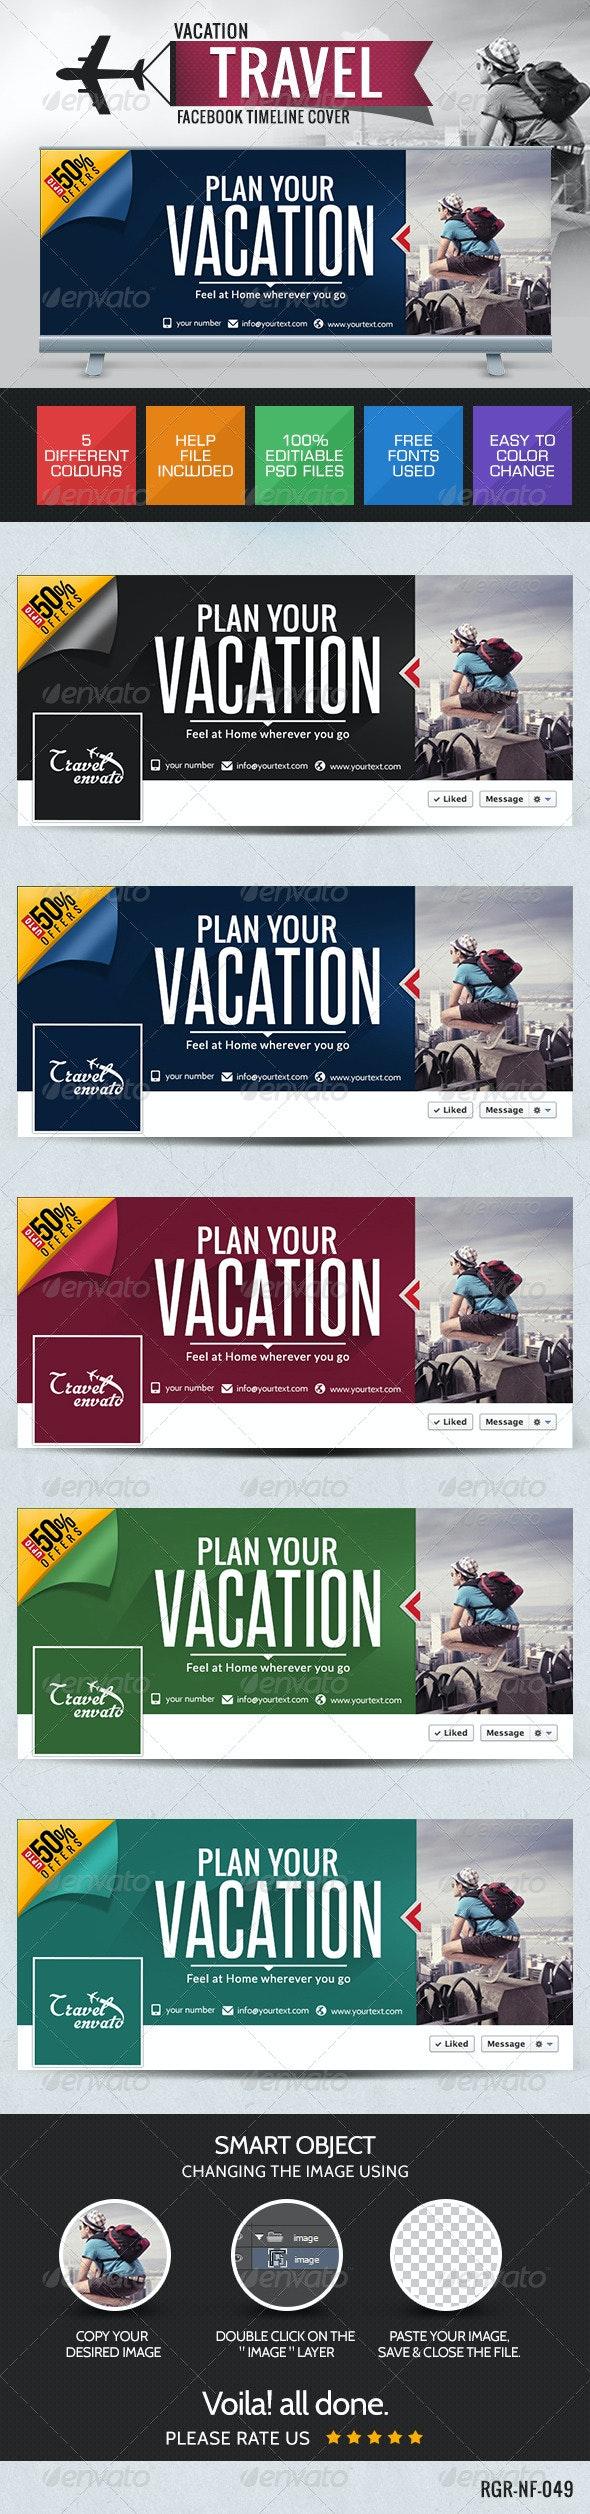 Travel Deals Facebook Cover - Facebook Timeline Covers Social Media